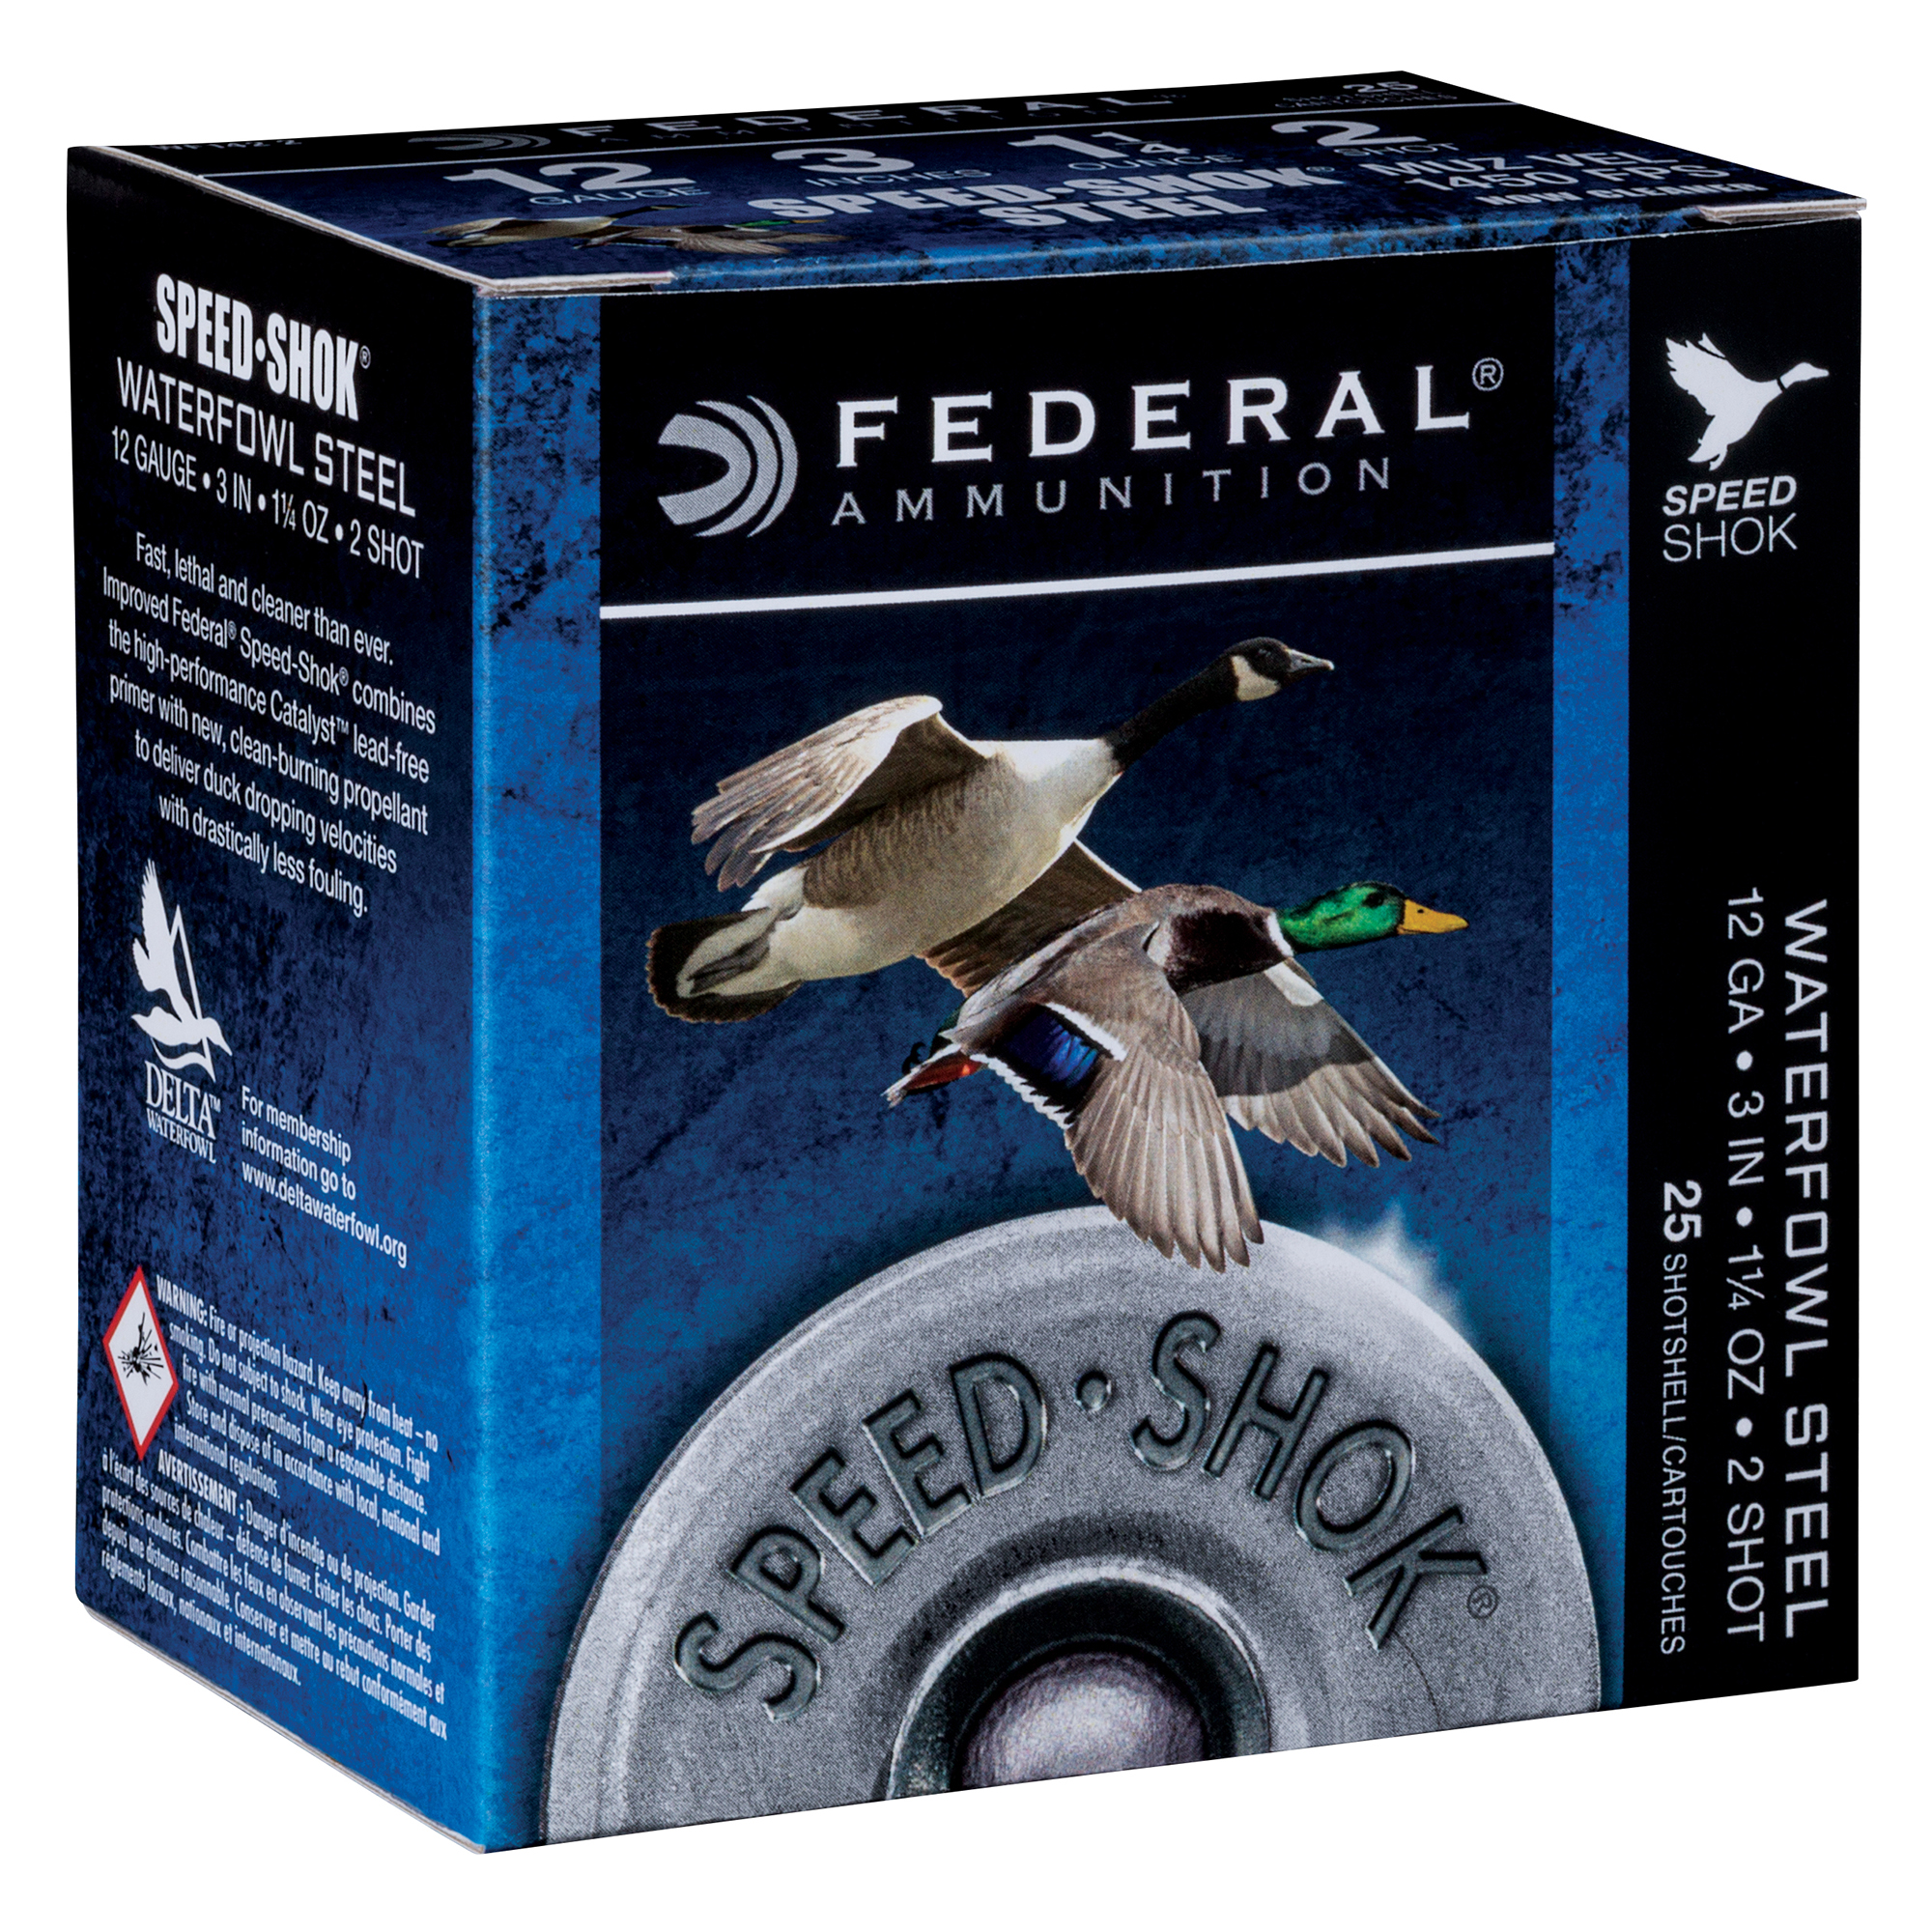 "Federal Premium Speed-Shok Steel Waterfowl Loads, 12-ga., 3"", 1-1/4 oz., 2"